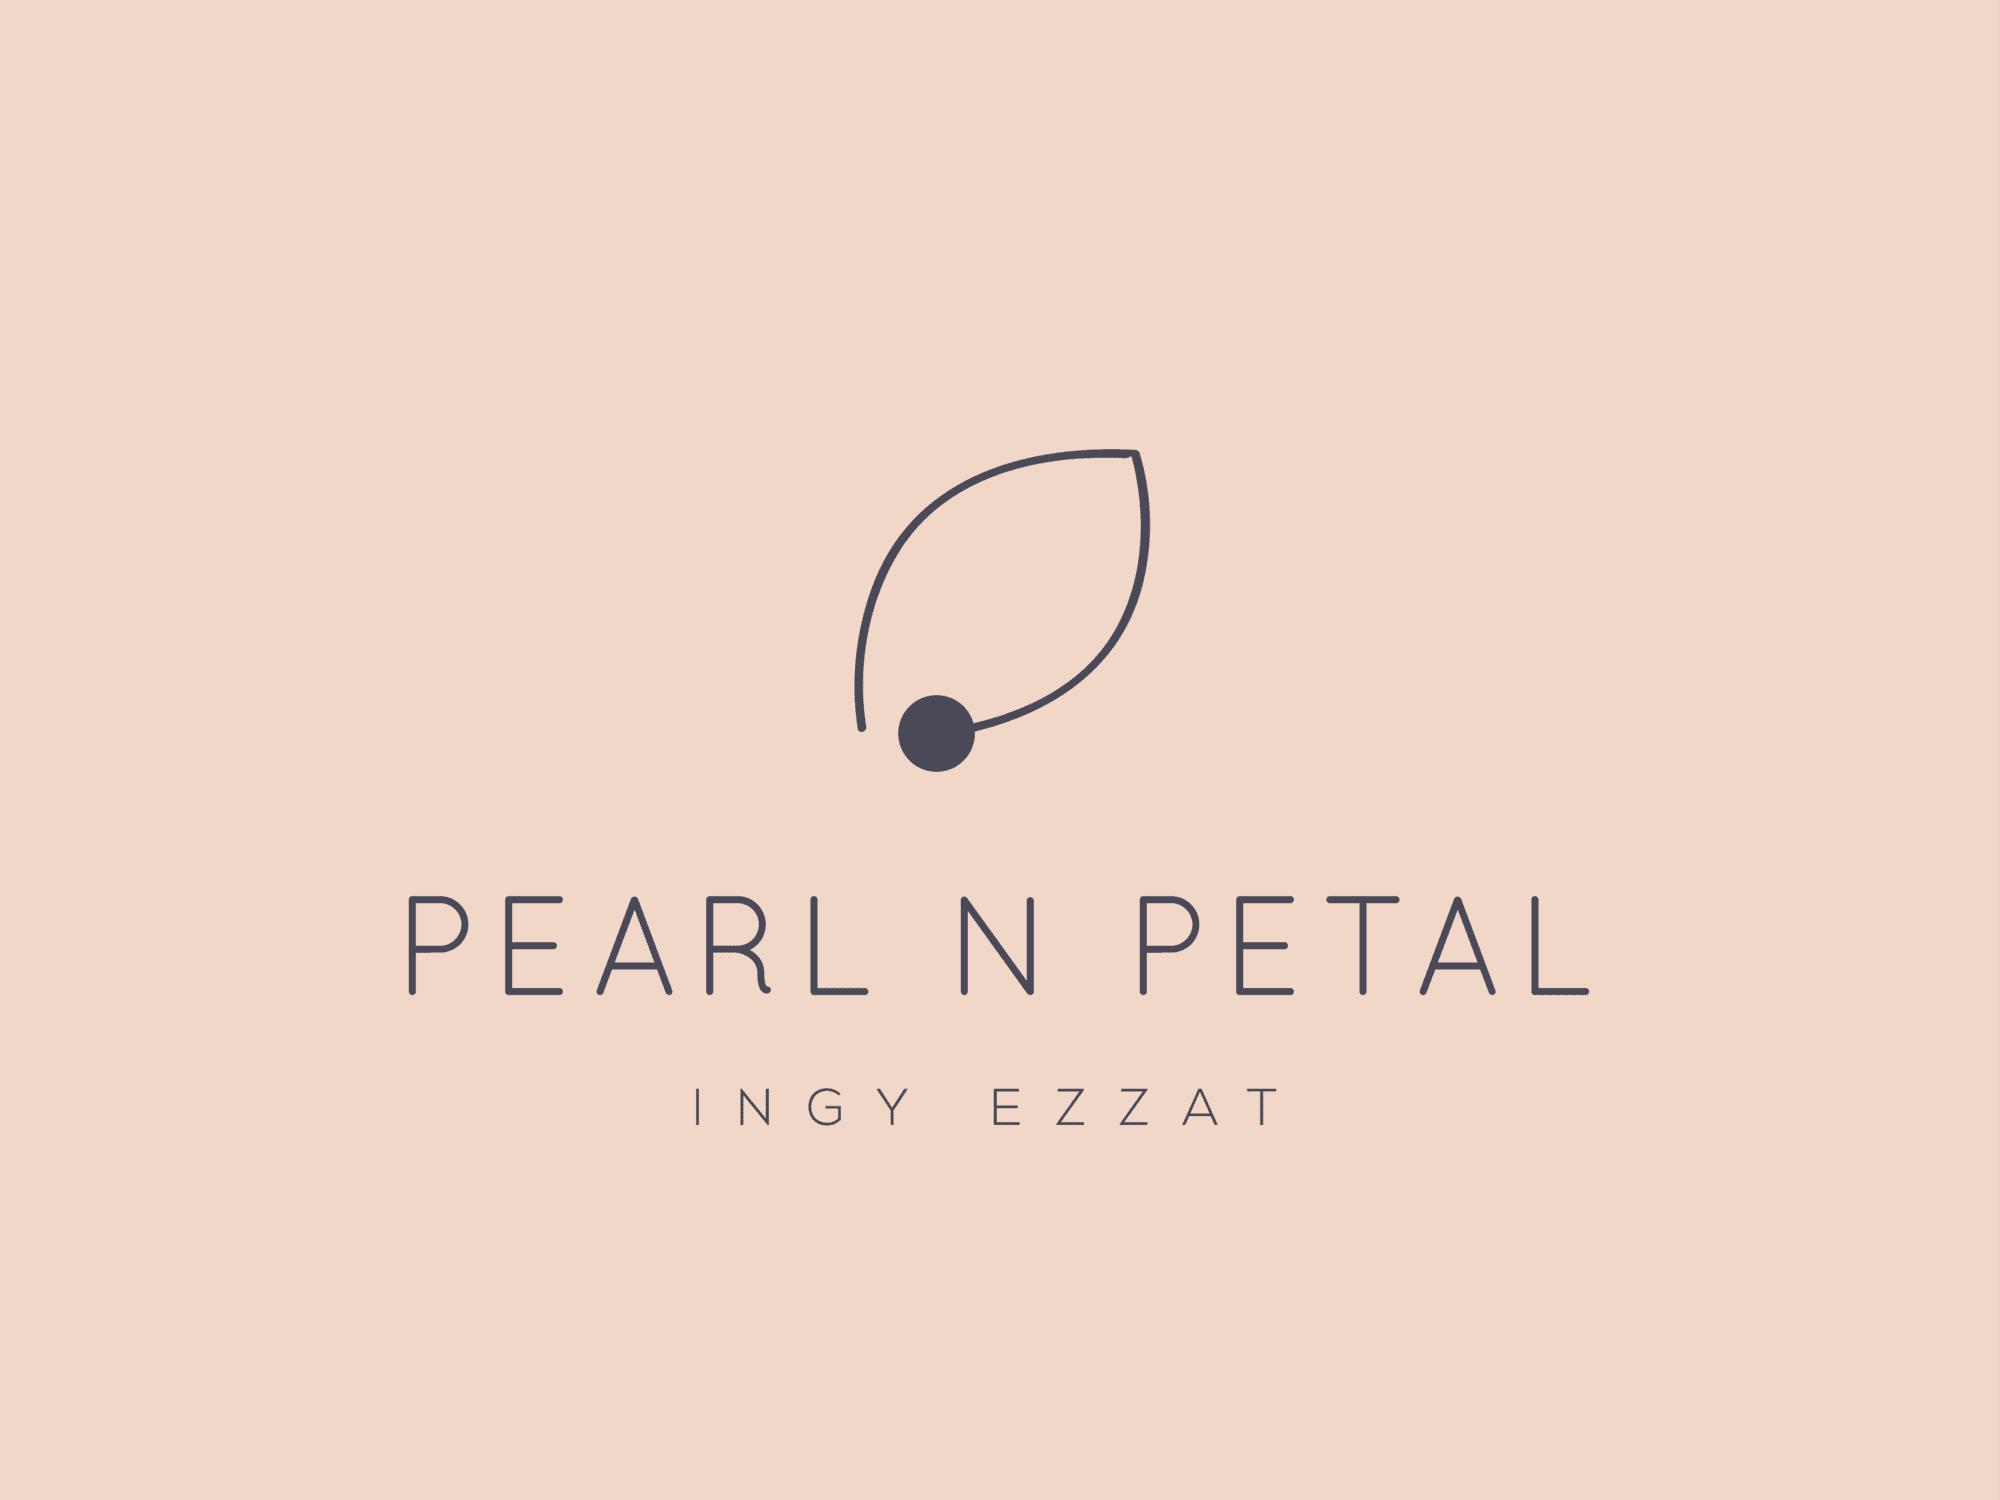 PearlNPetalFInal-0